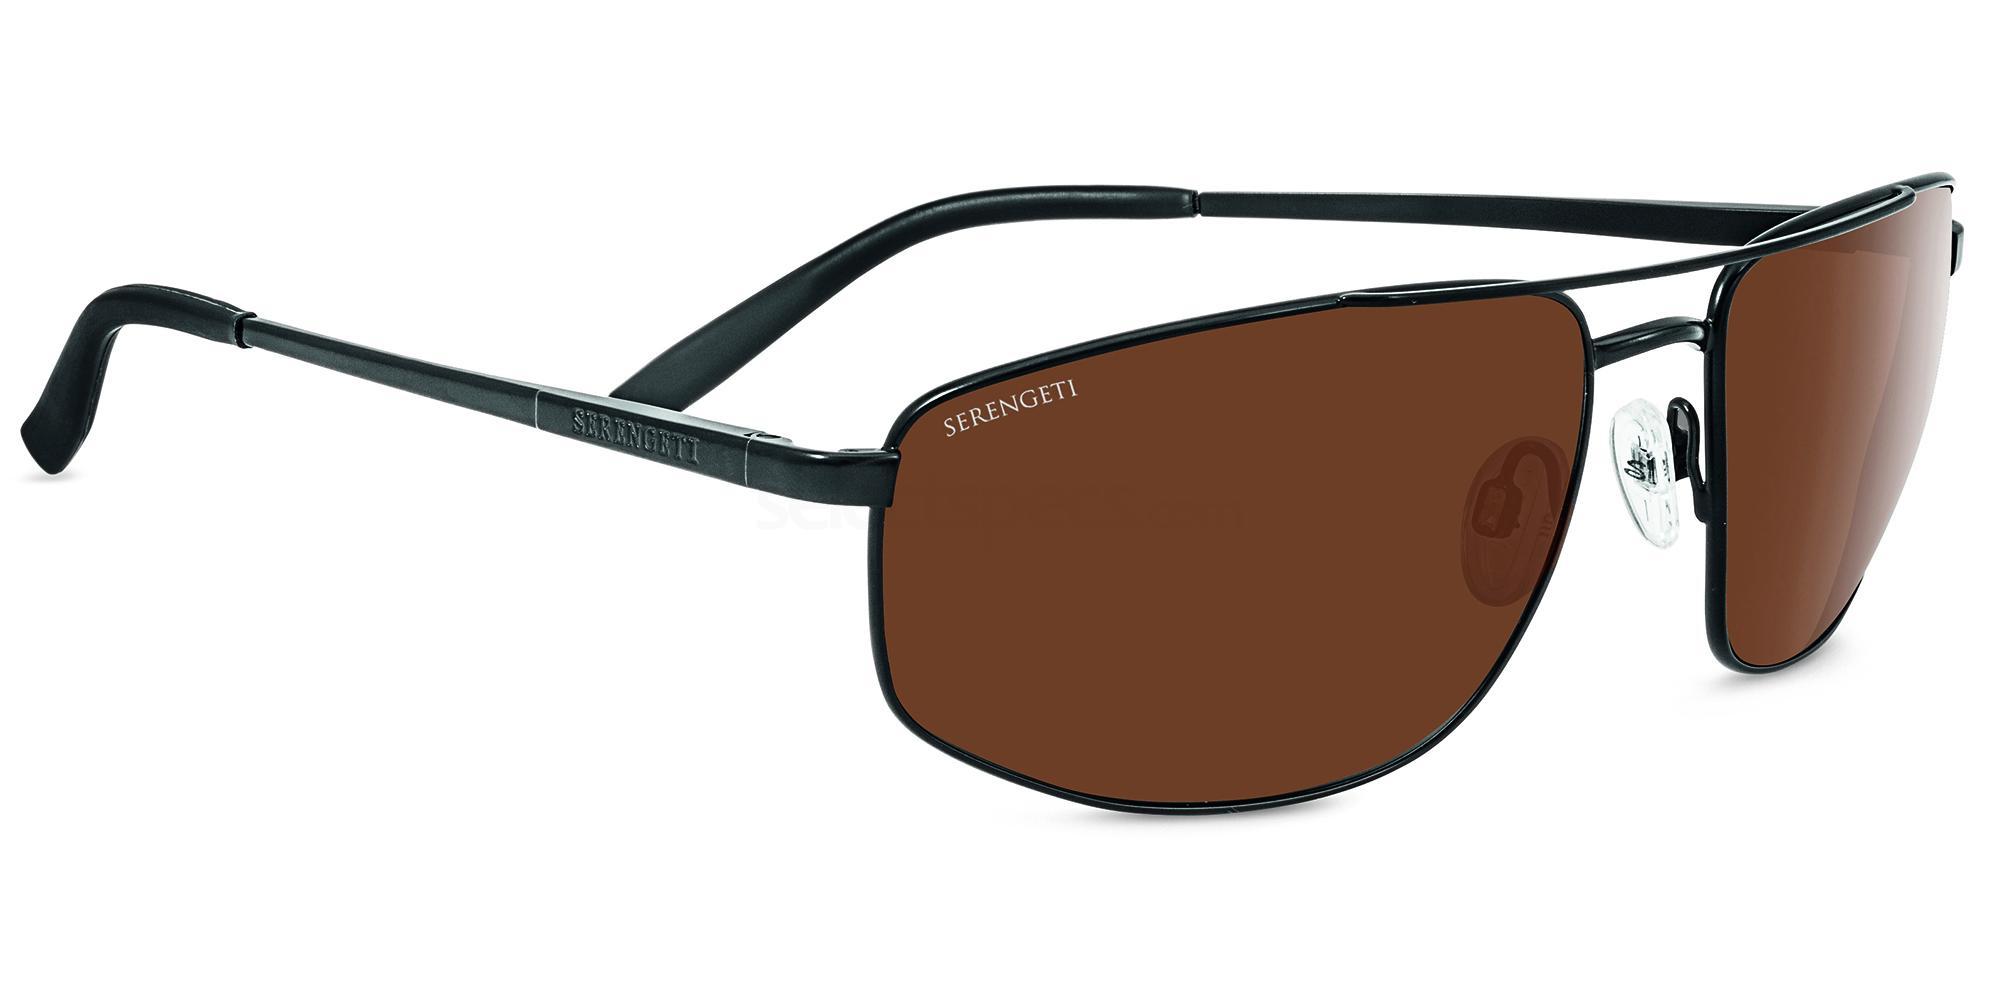 8406 Classics MODUGNO Sunglasses, Serengeti